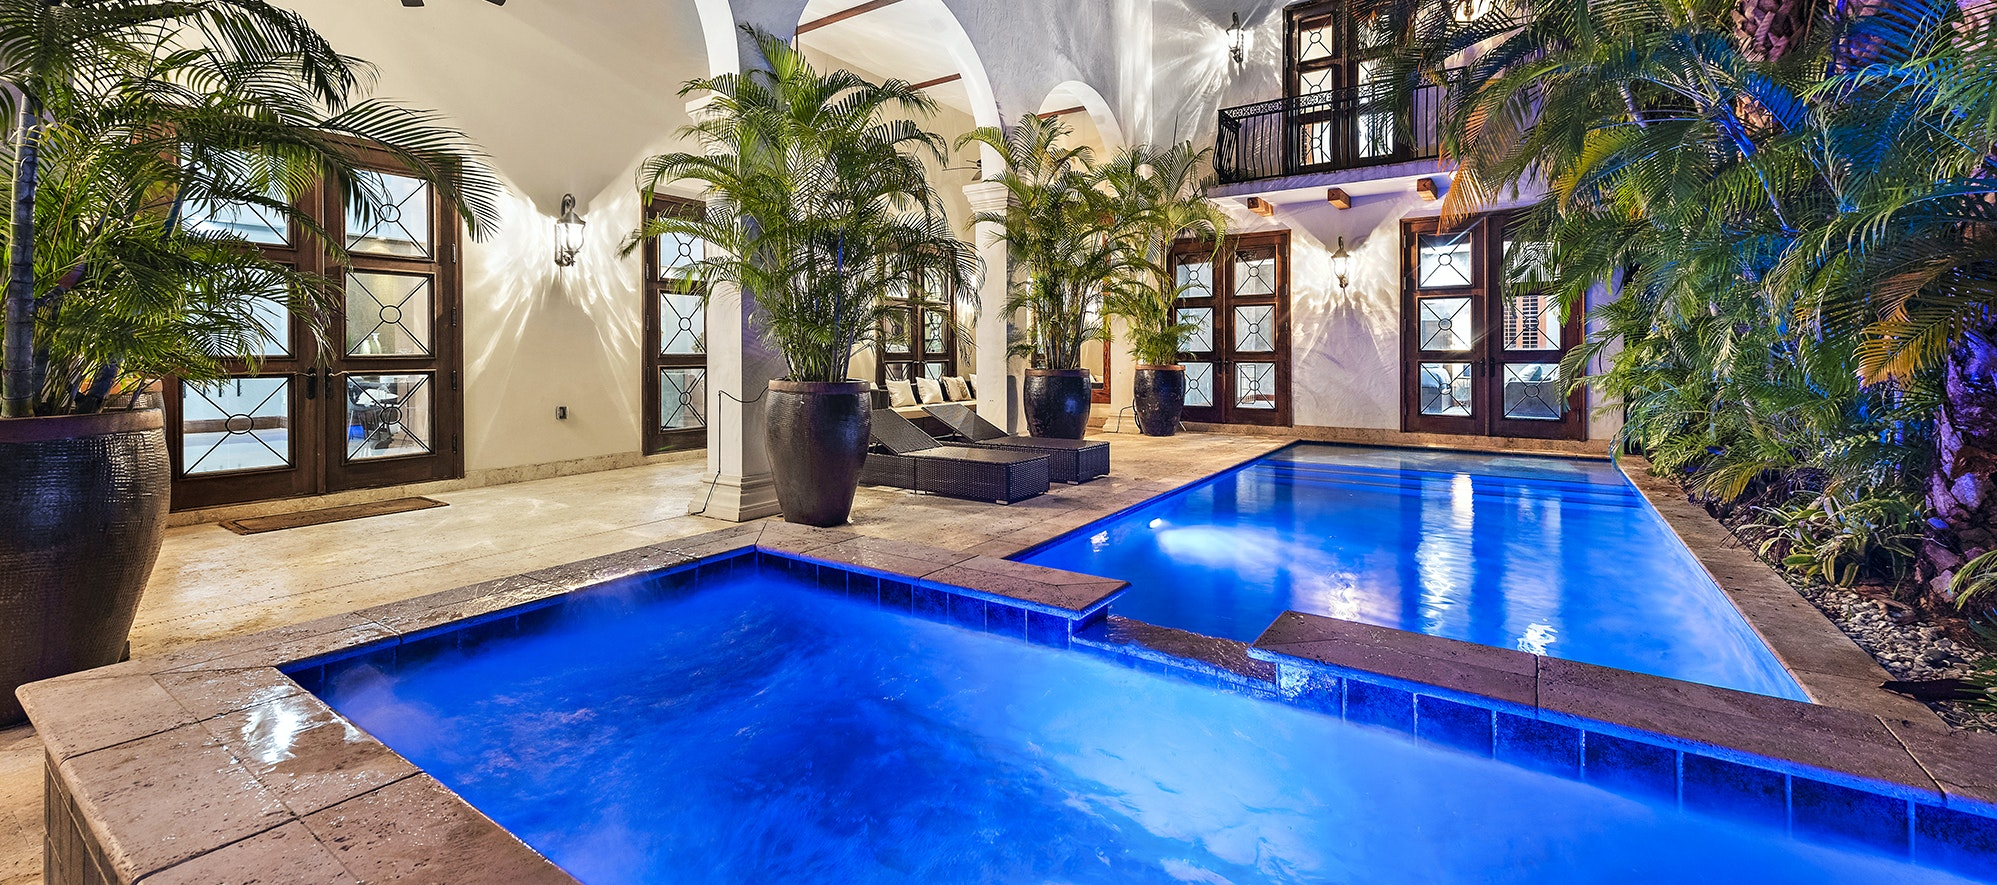 Villa Philippe luxury rental in Fort Lauderdale